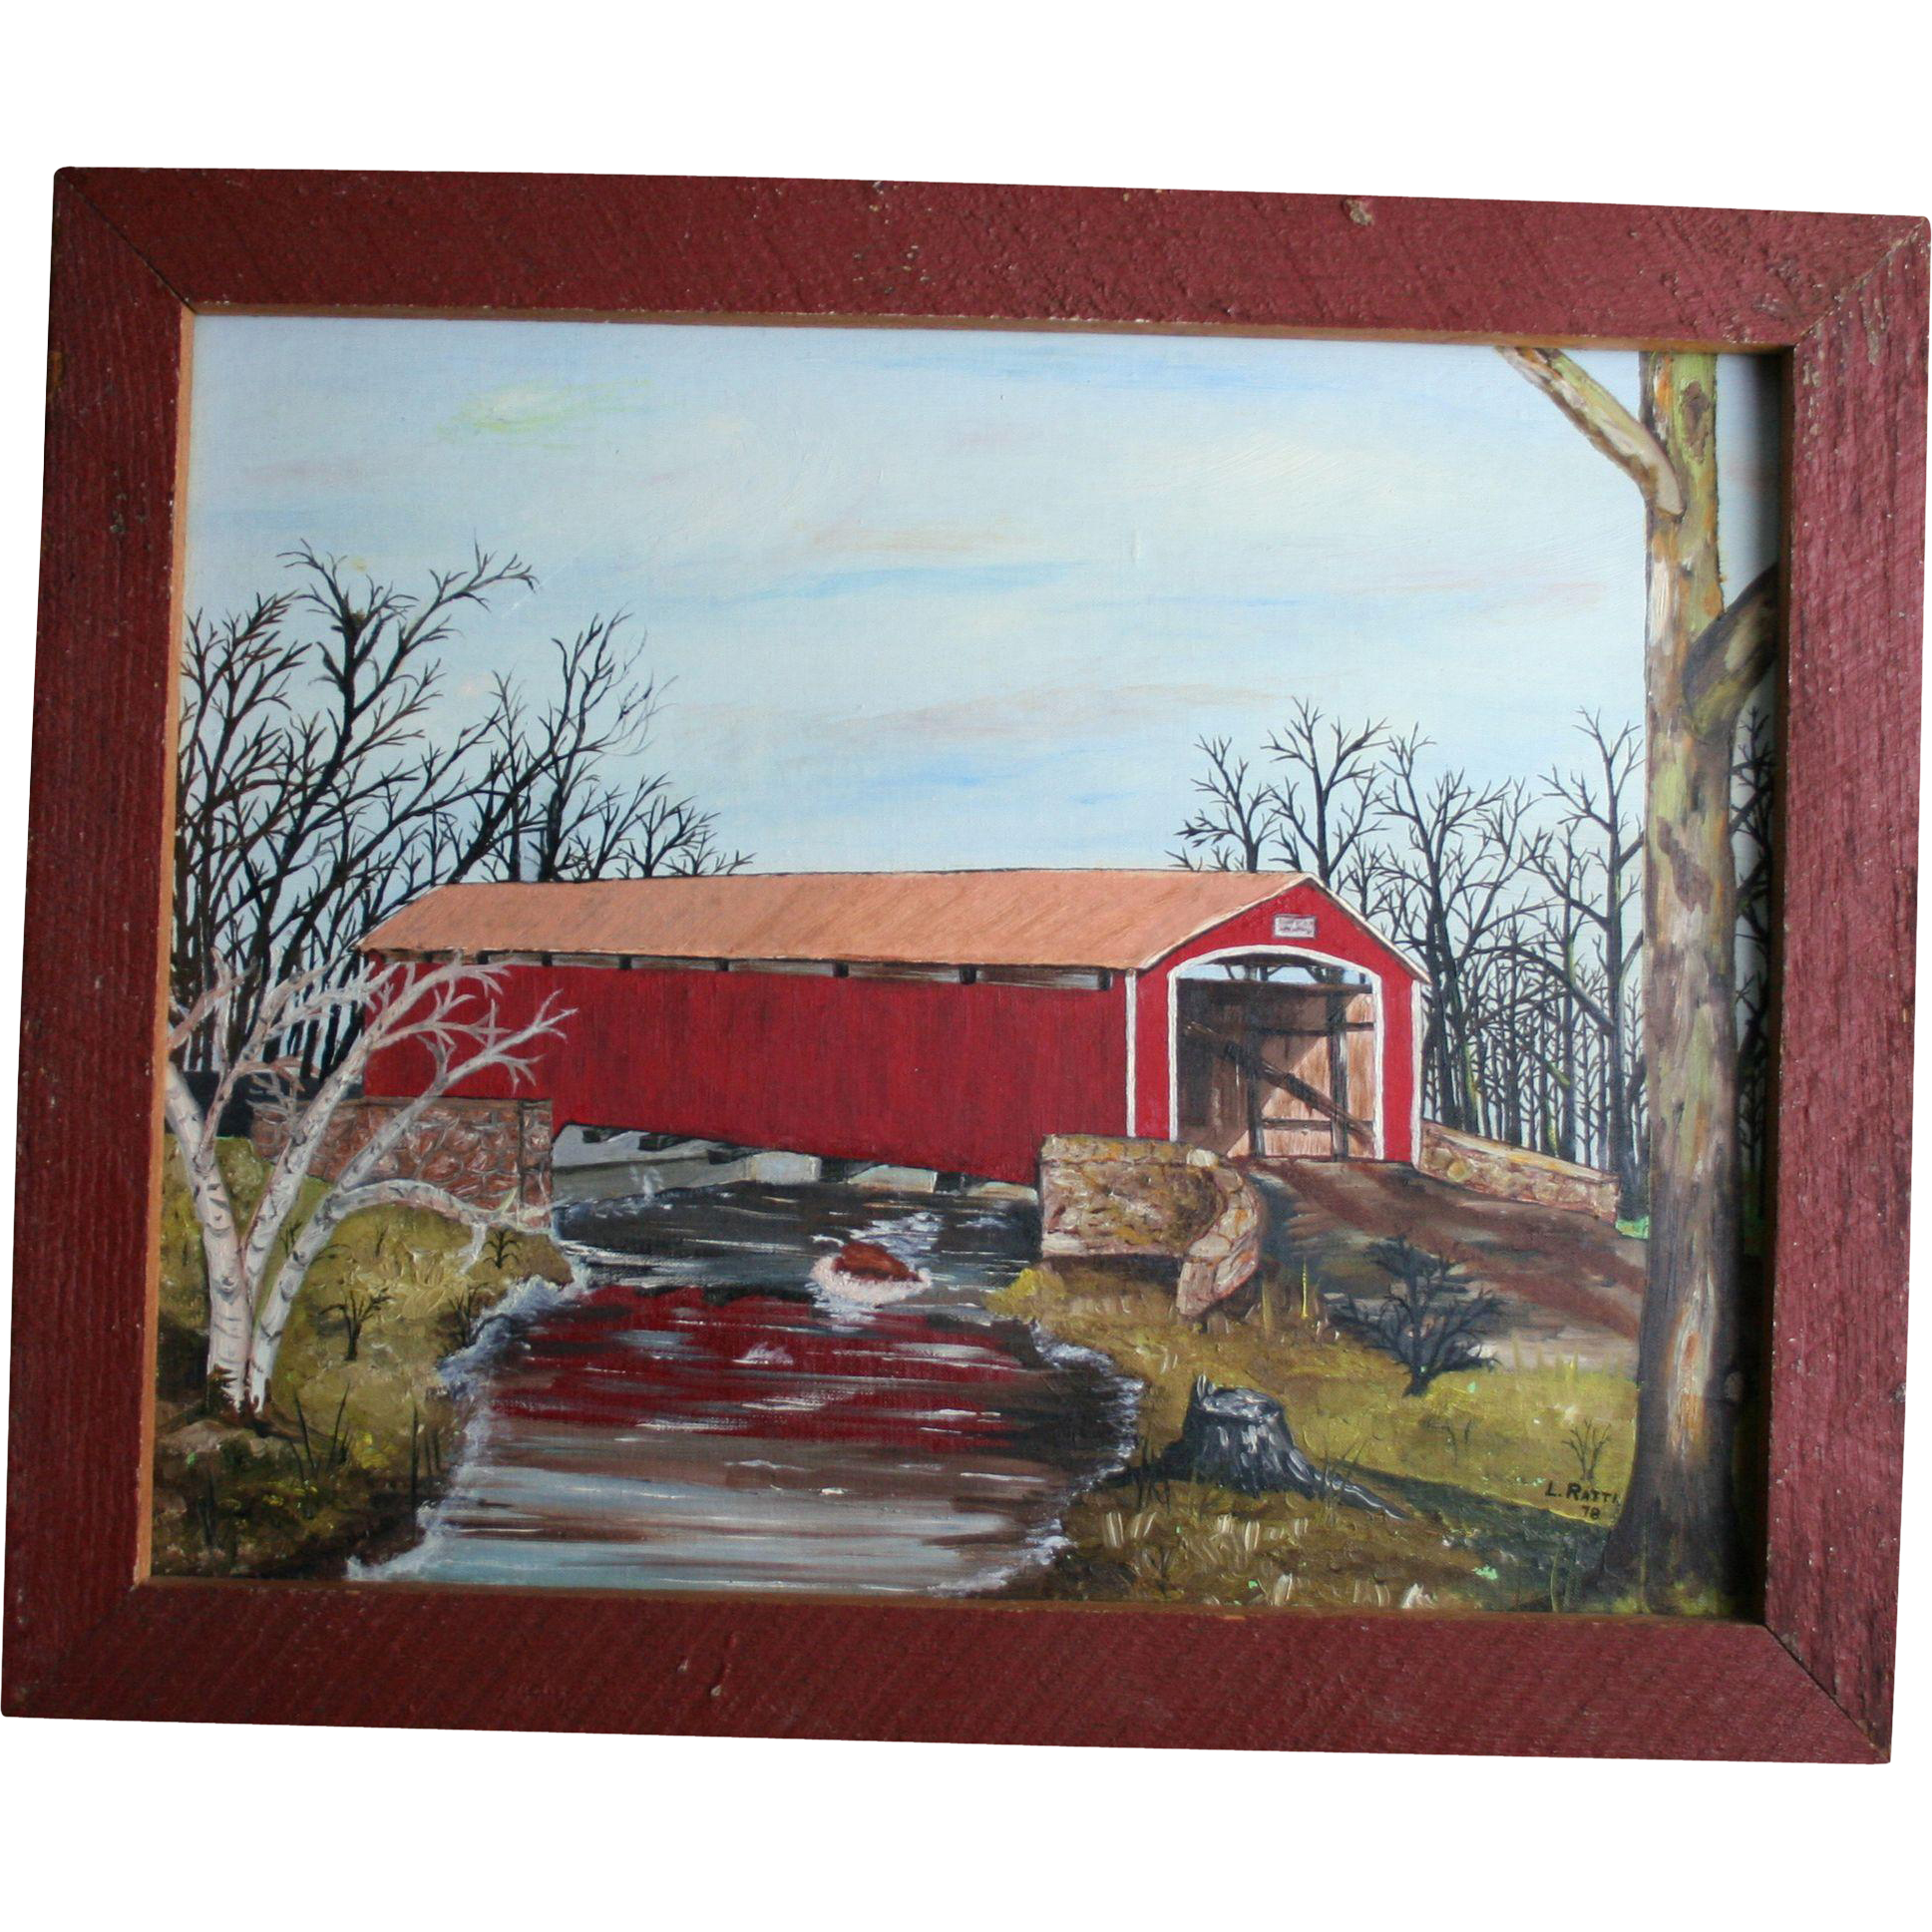 Conewago Creek Pennsylvania Oil Painting Red Covered Bridge Brushtown York